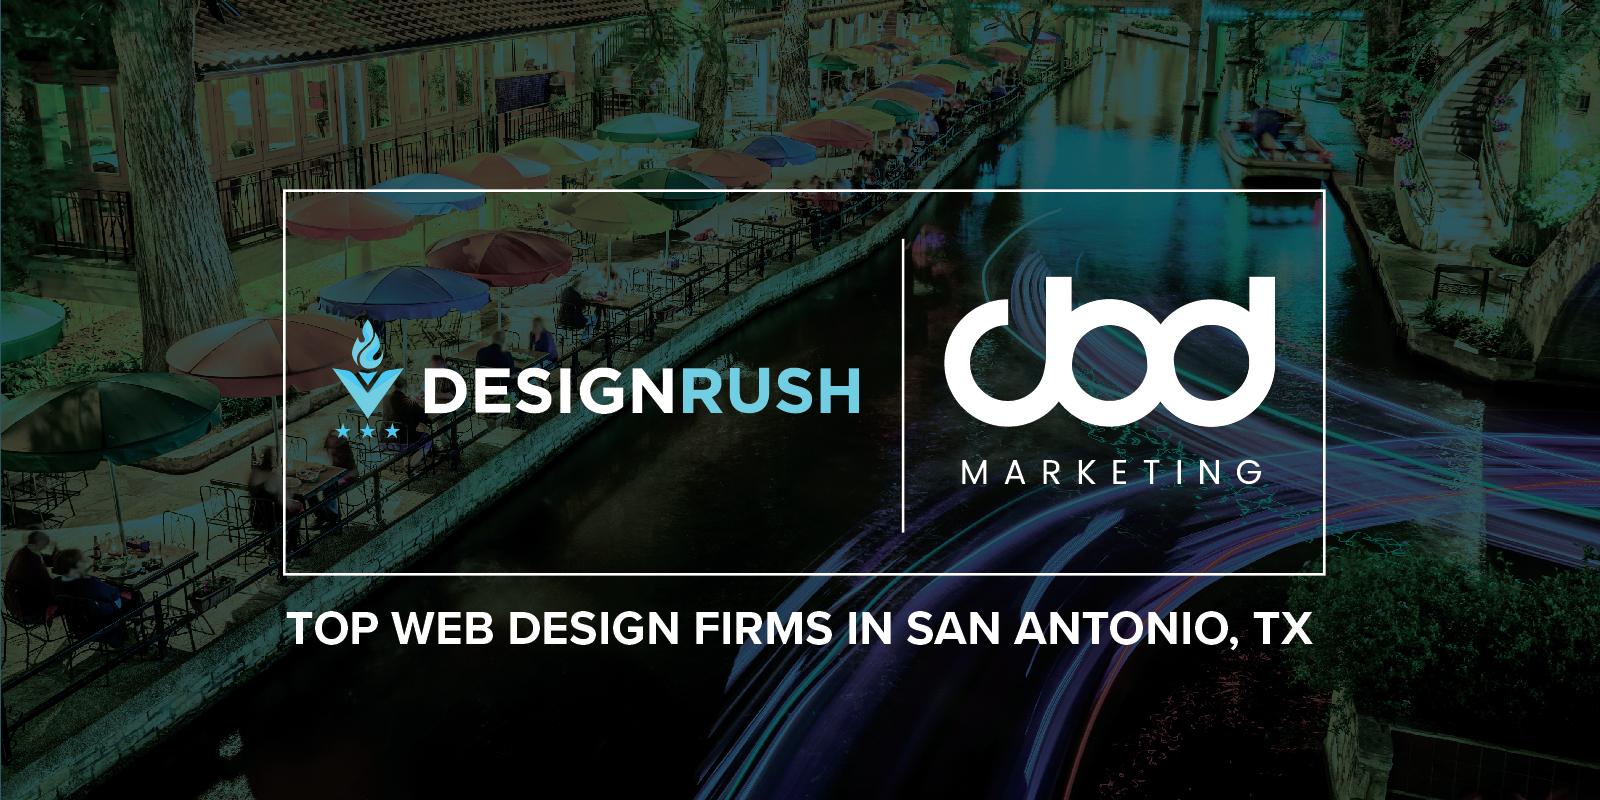 CBD Named Top Web Design Firm by DesignRush